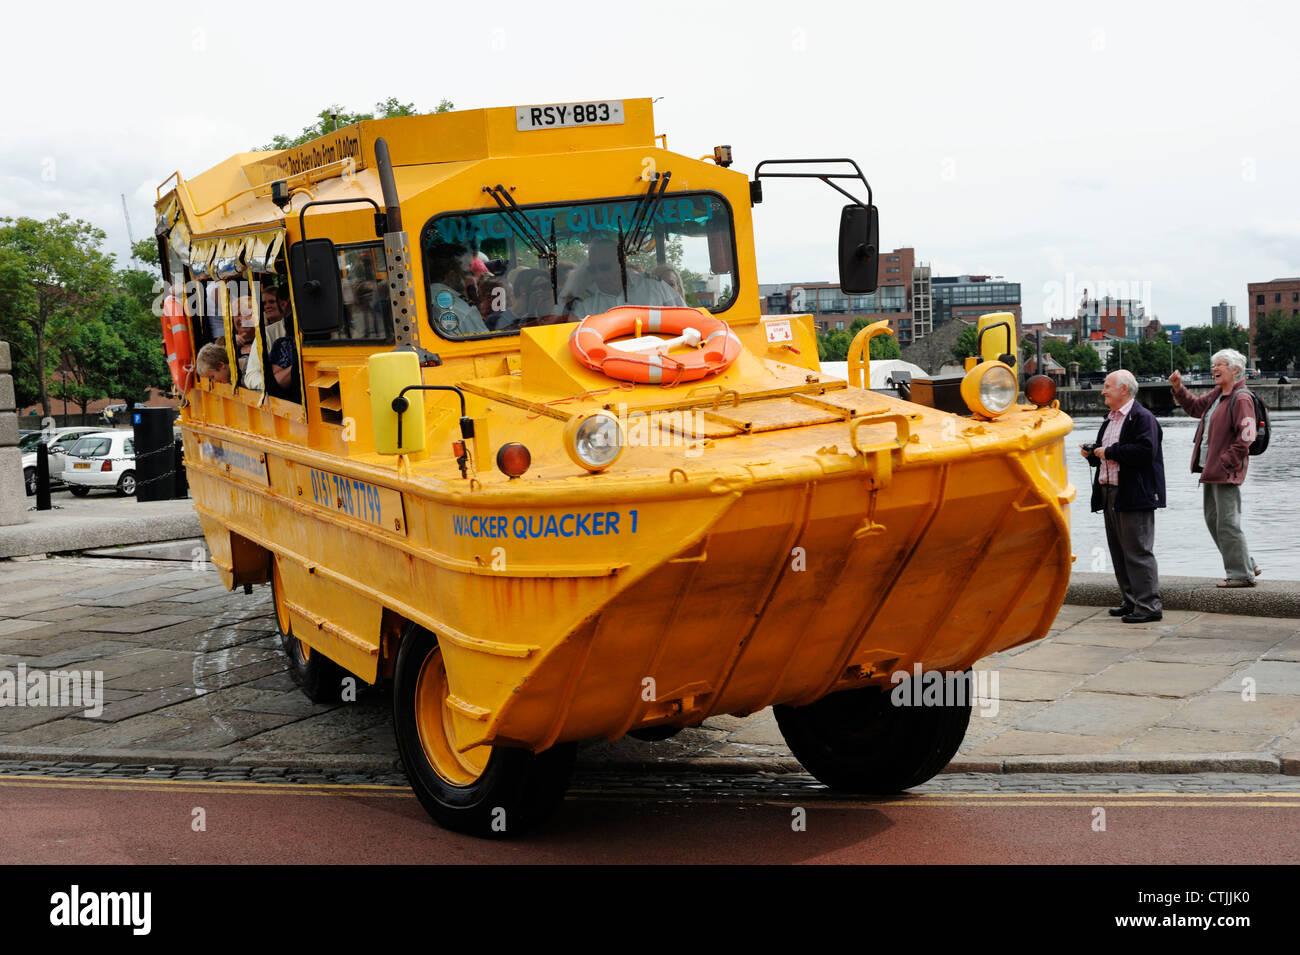 Liverpool Wacker Quacker gelbe Boot Tour Fahrzeug Stockbild